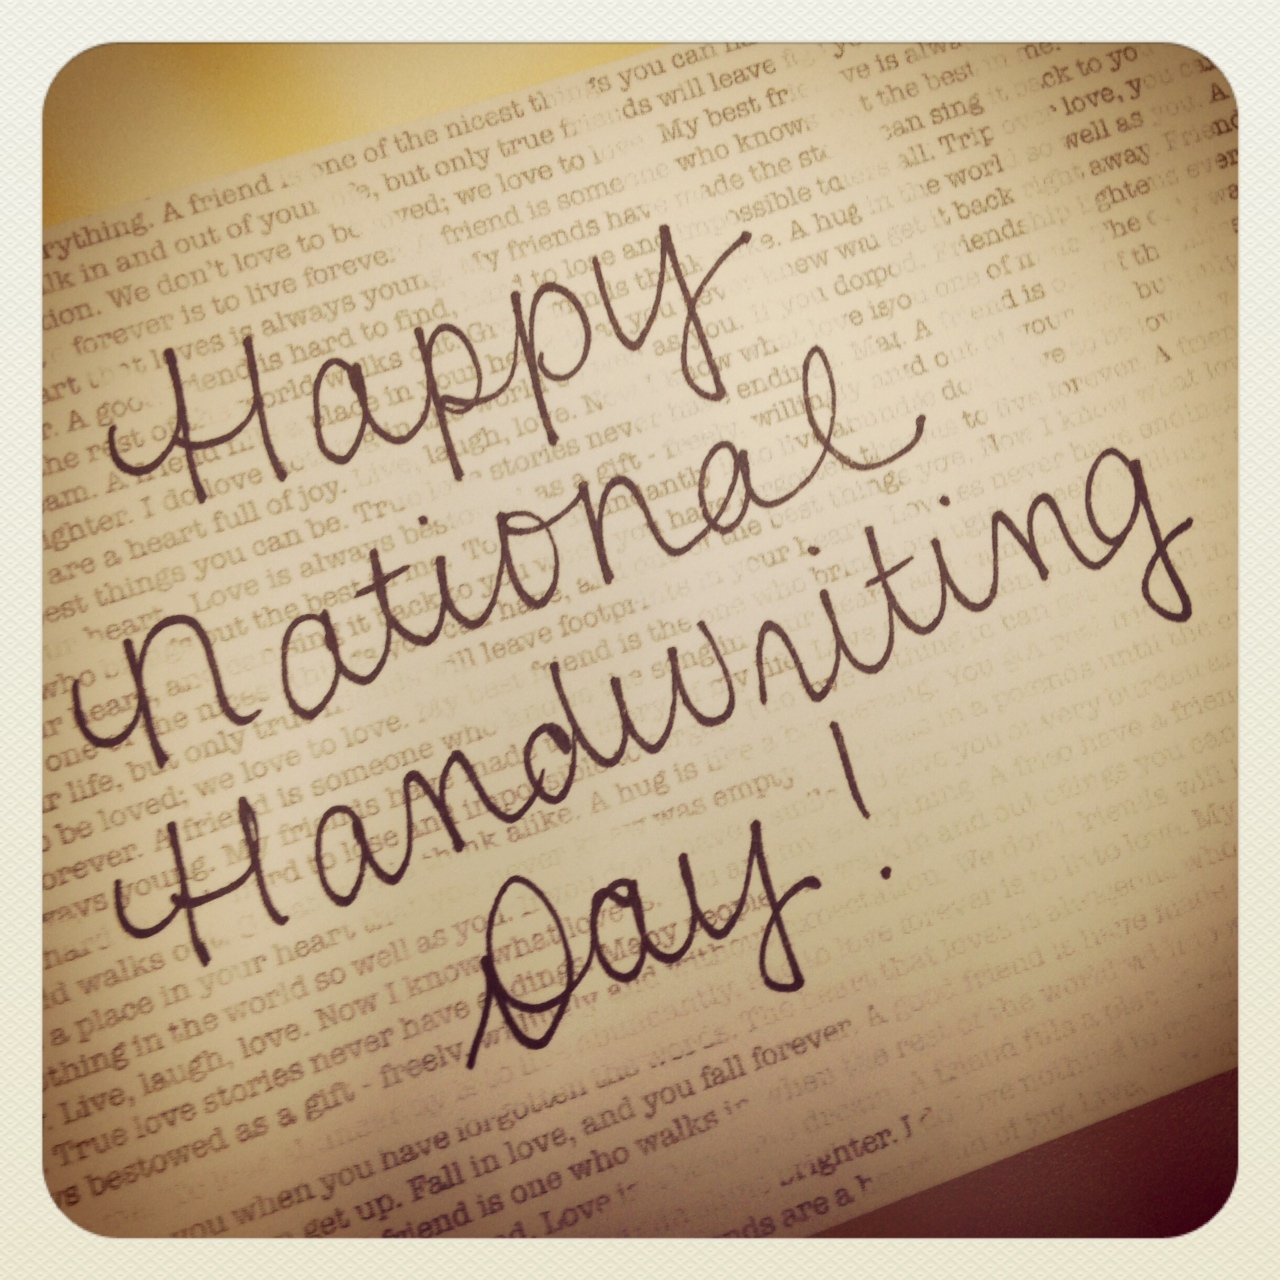 Happy National Handwriting Day Jan 23